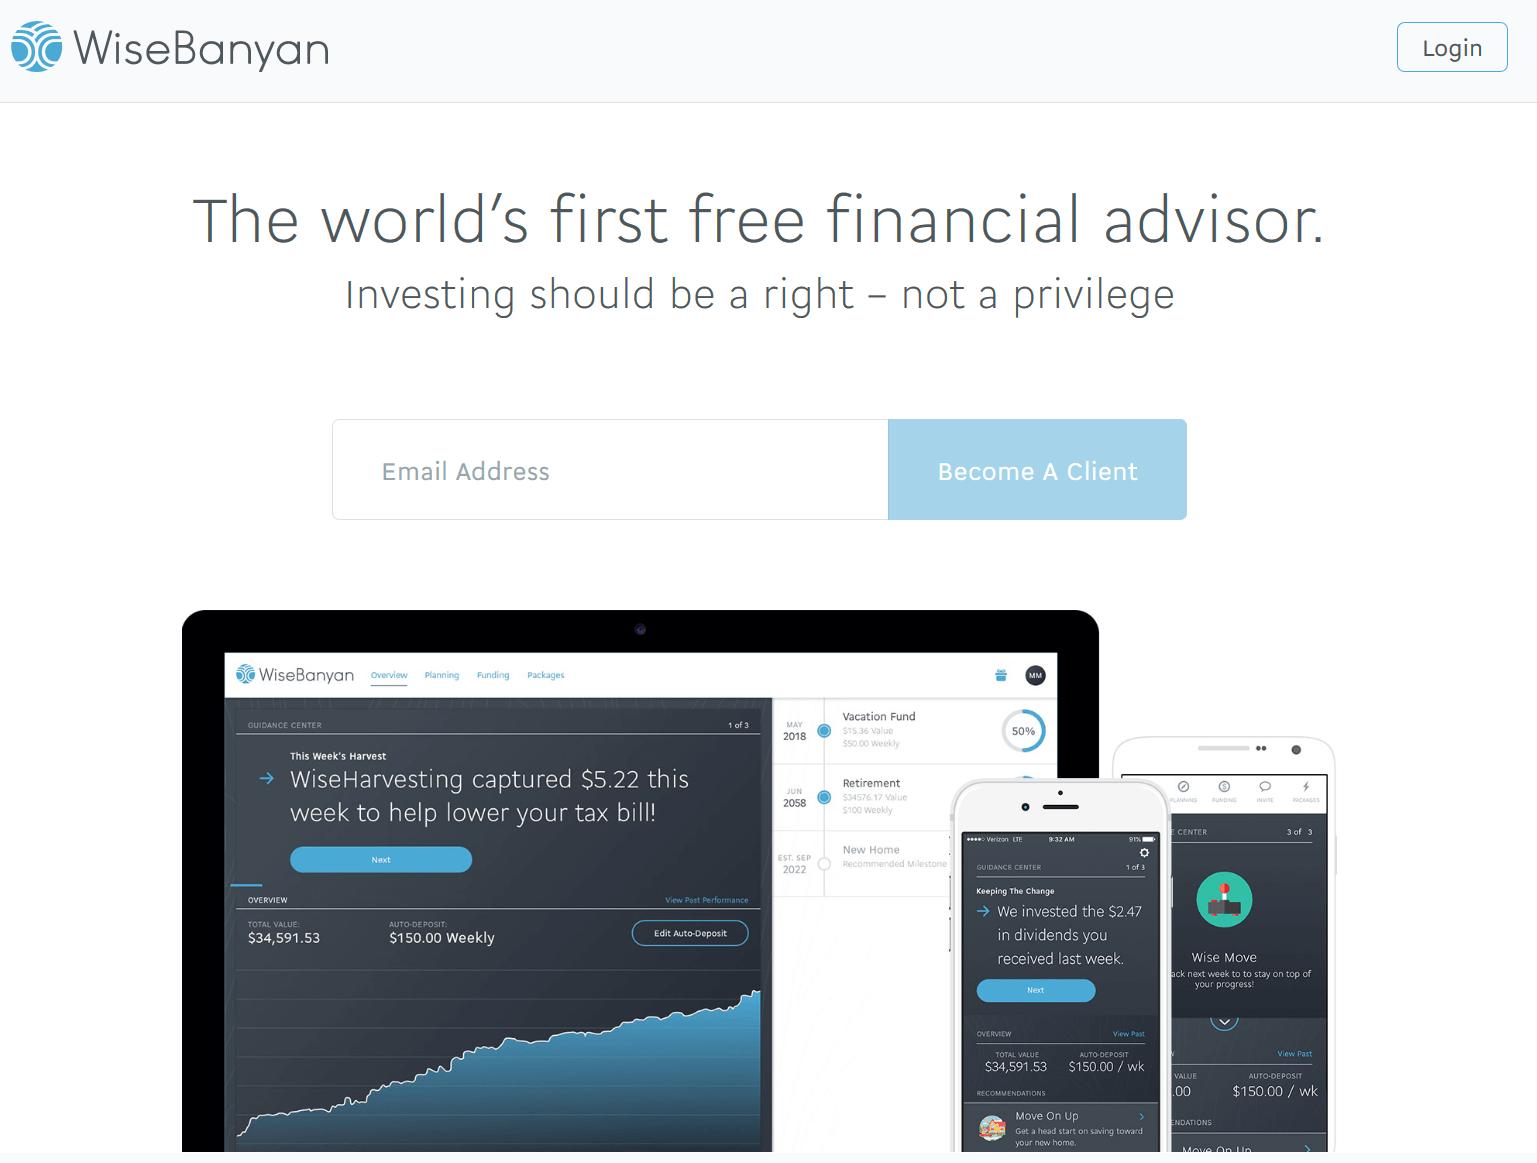 WiseBanyan | First free financial advisor